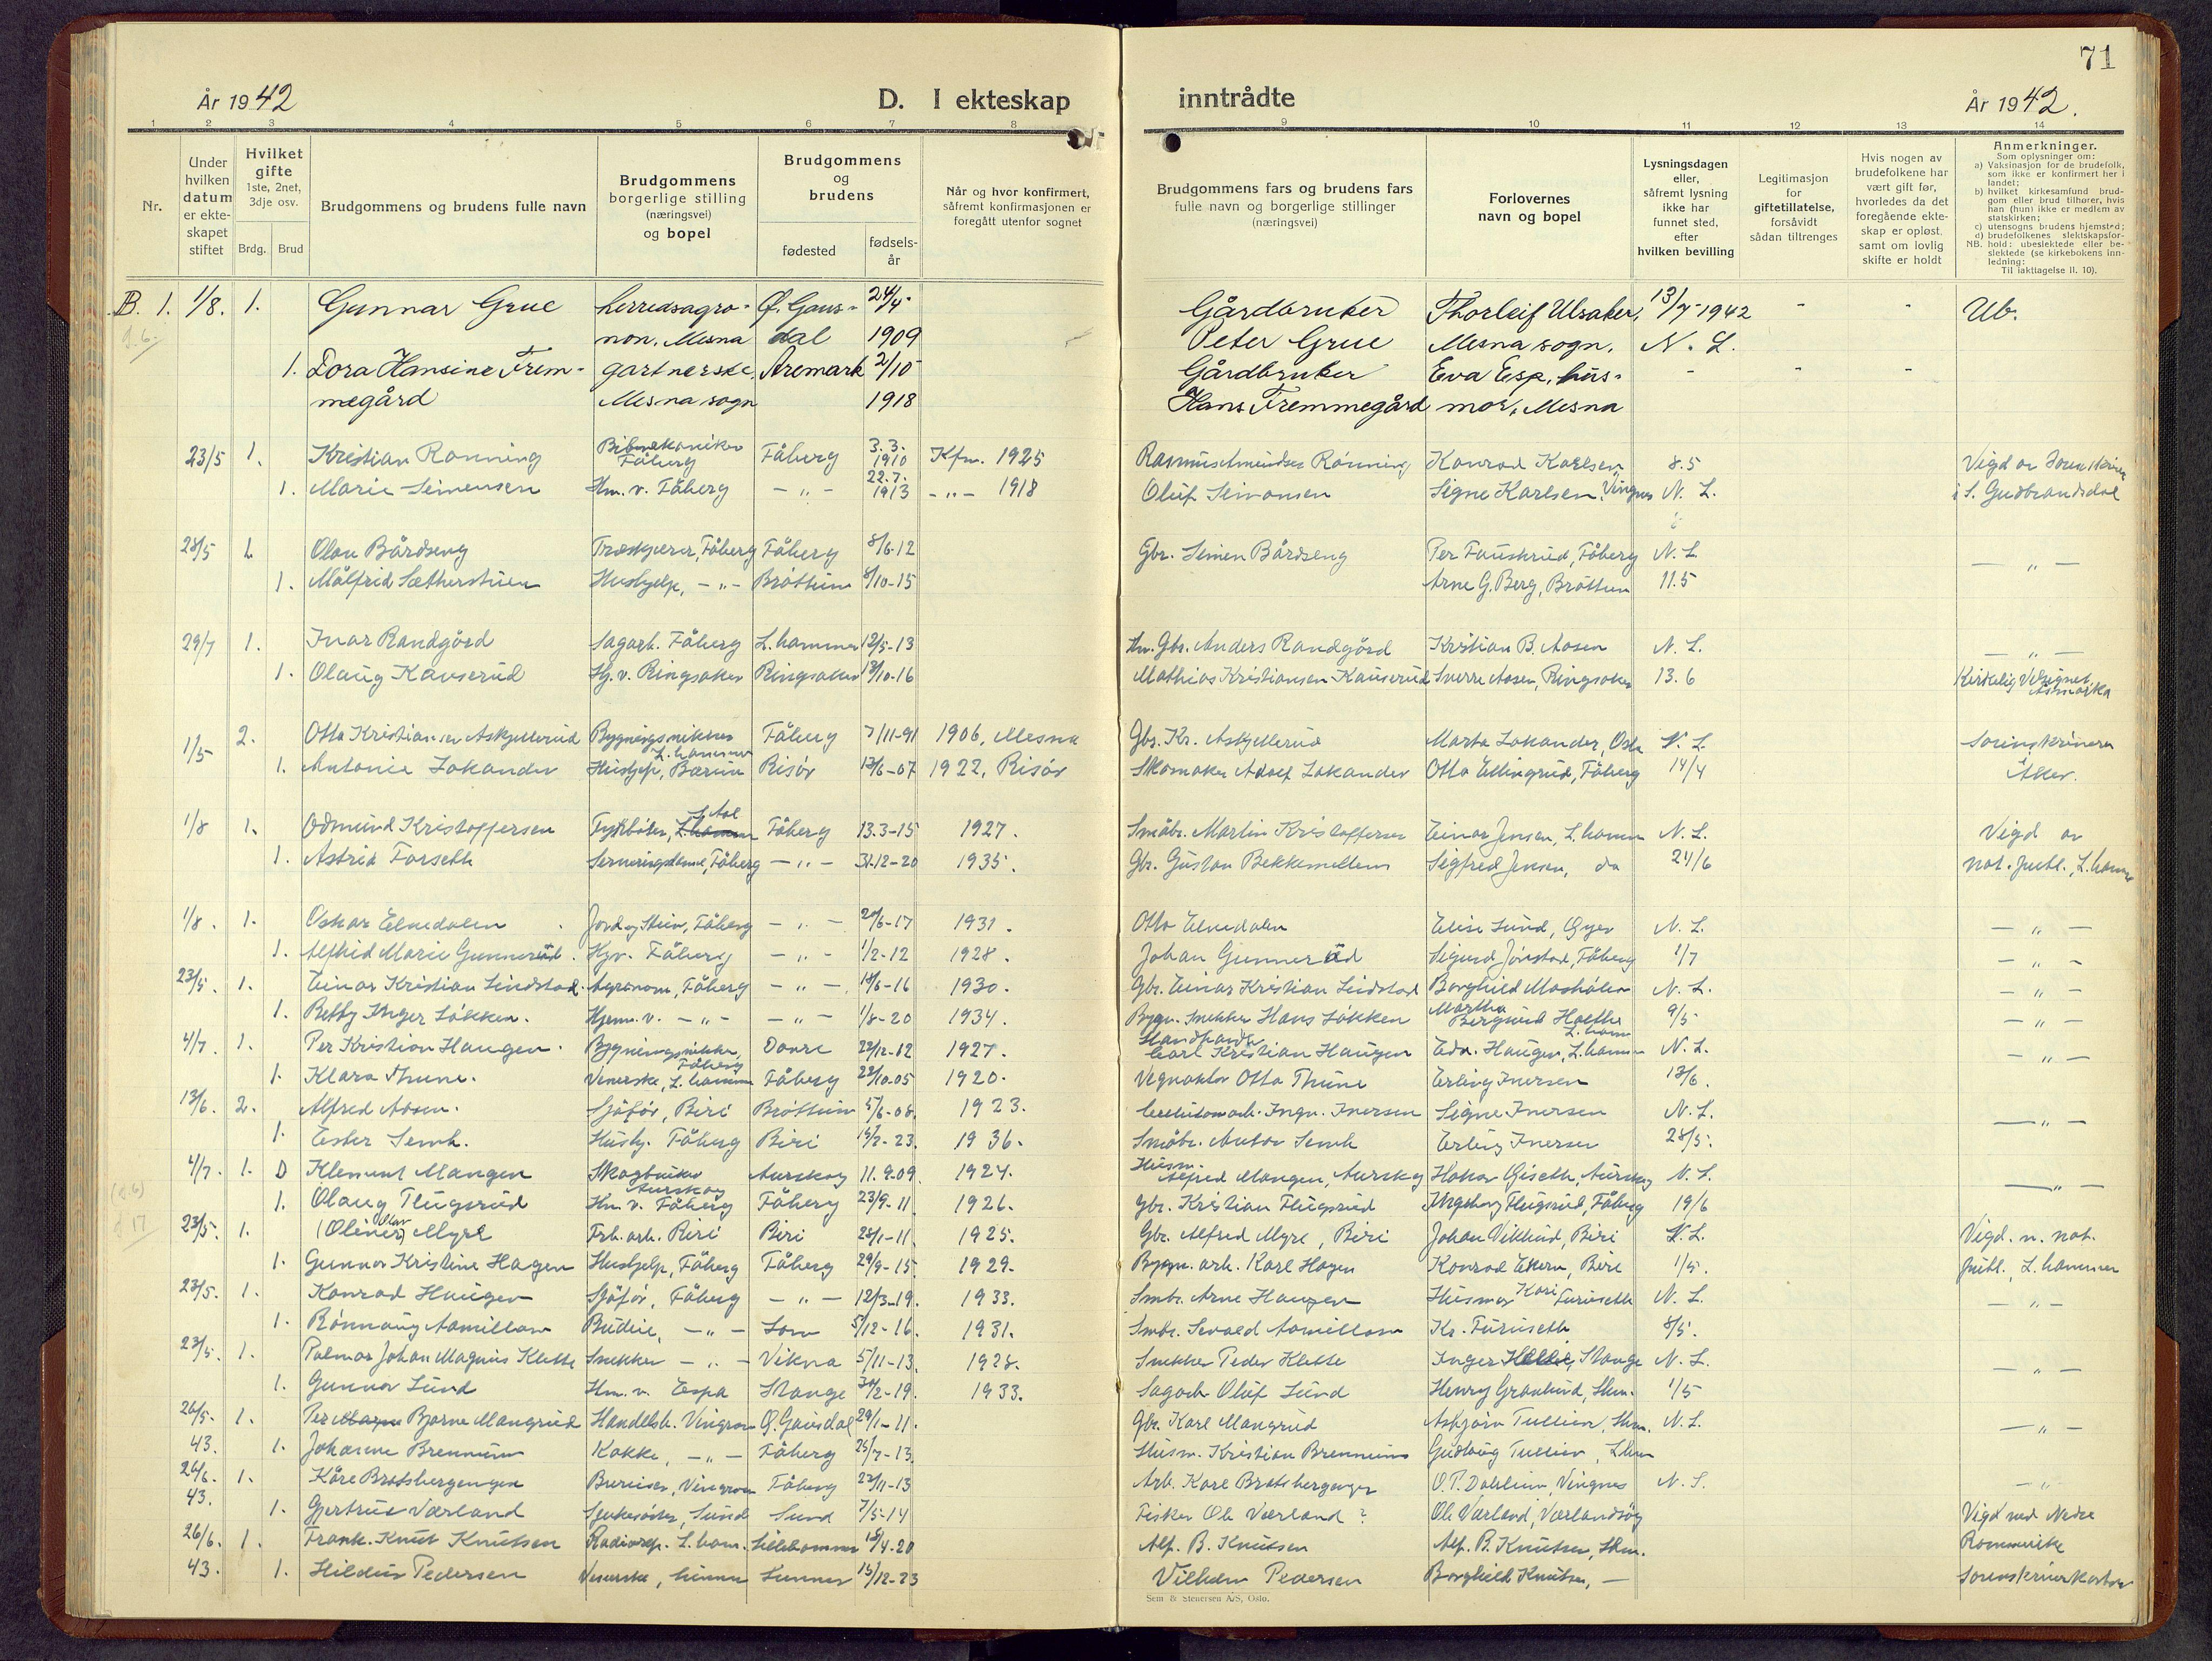 SAH, Fåberg prestekontor, H/Ha/Hab/L0018: Parish register (copy) no. 18, 1940-1967, p. 71